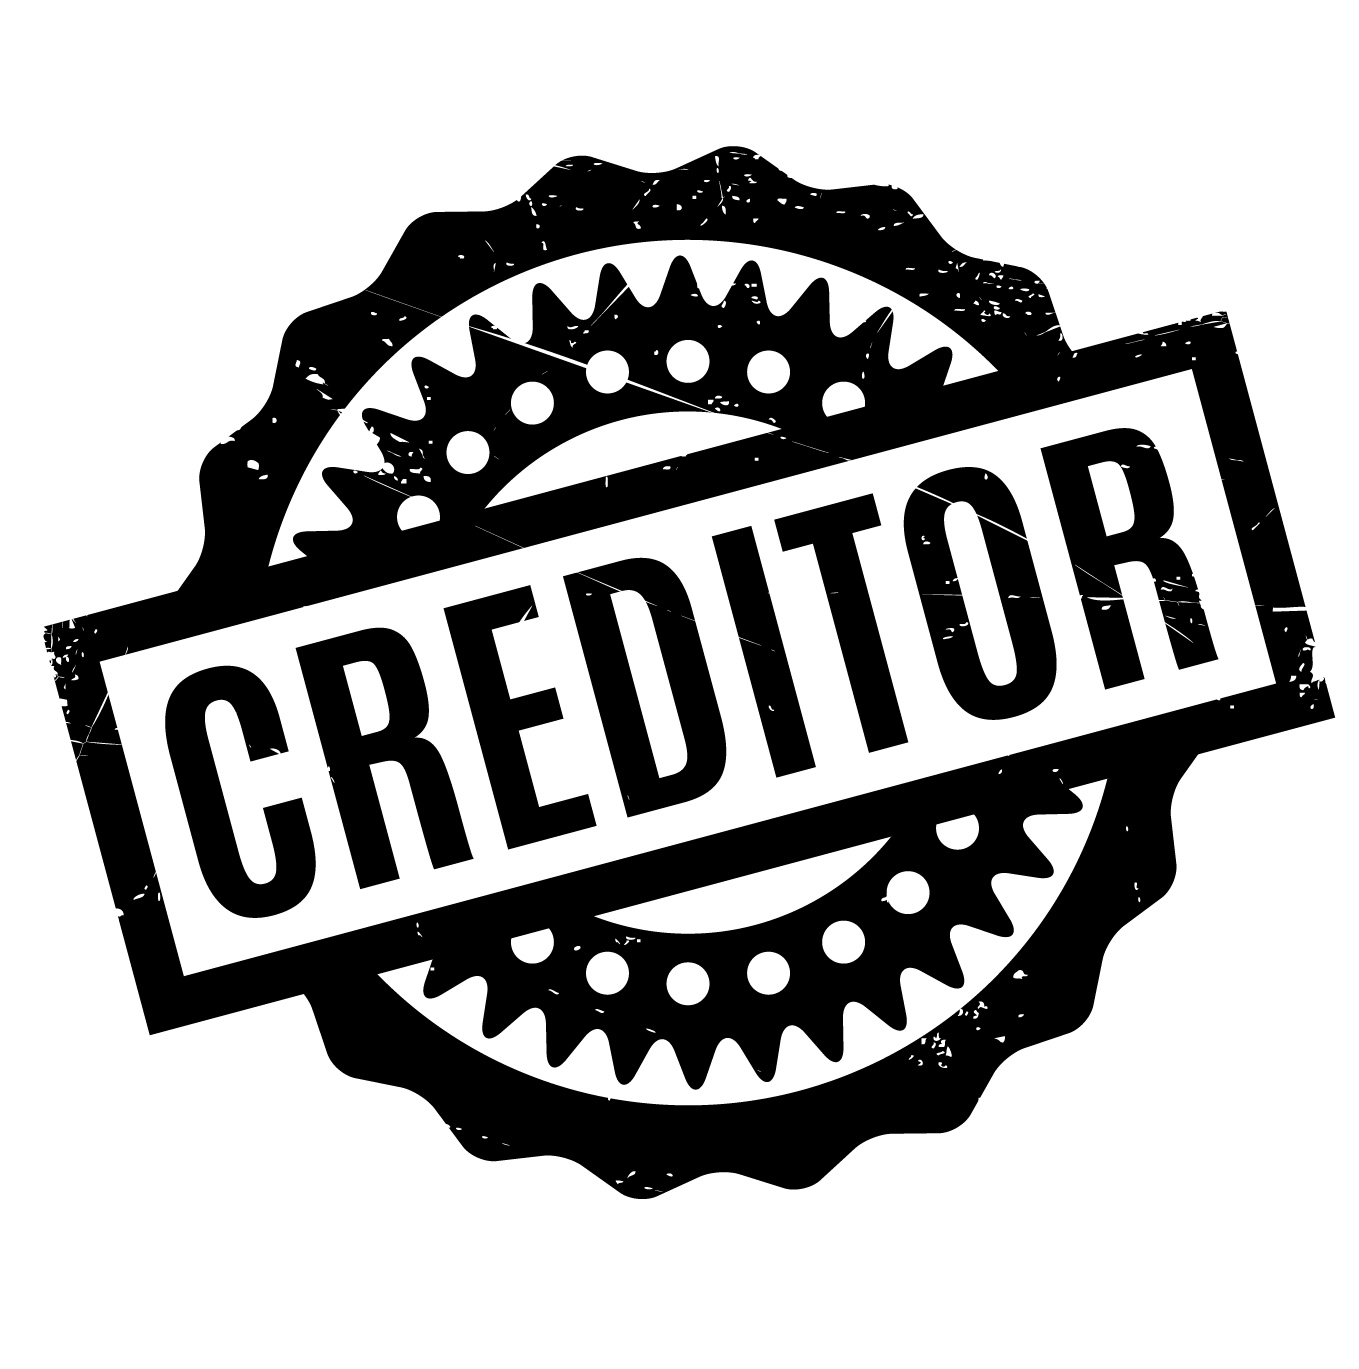 Кредитор – значение и функции